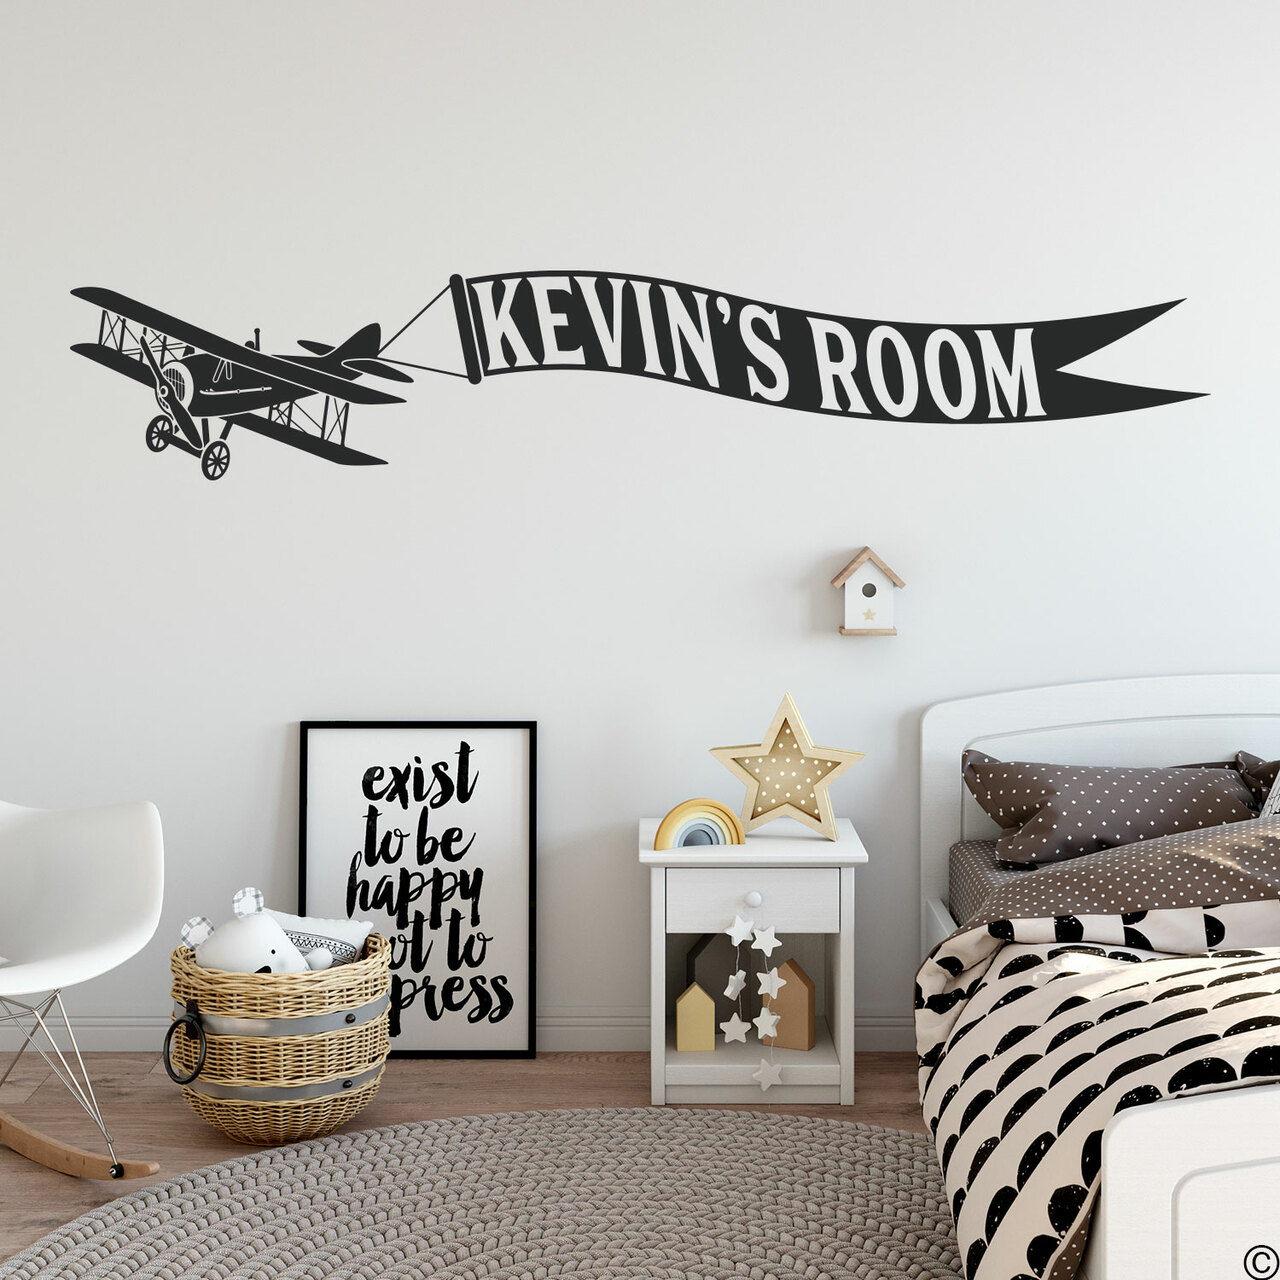 Biplane Banner